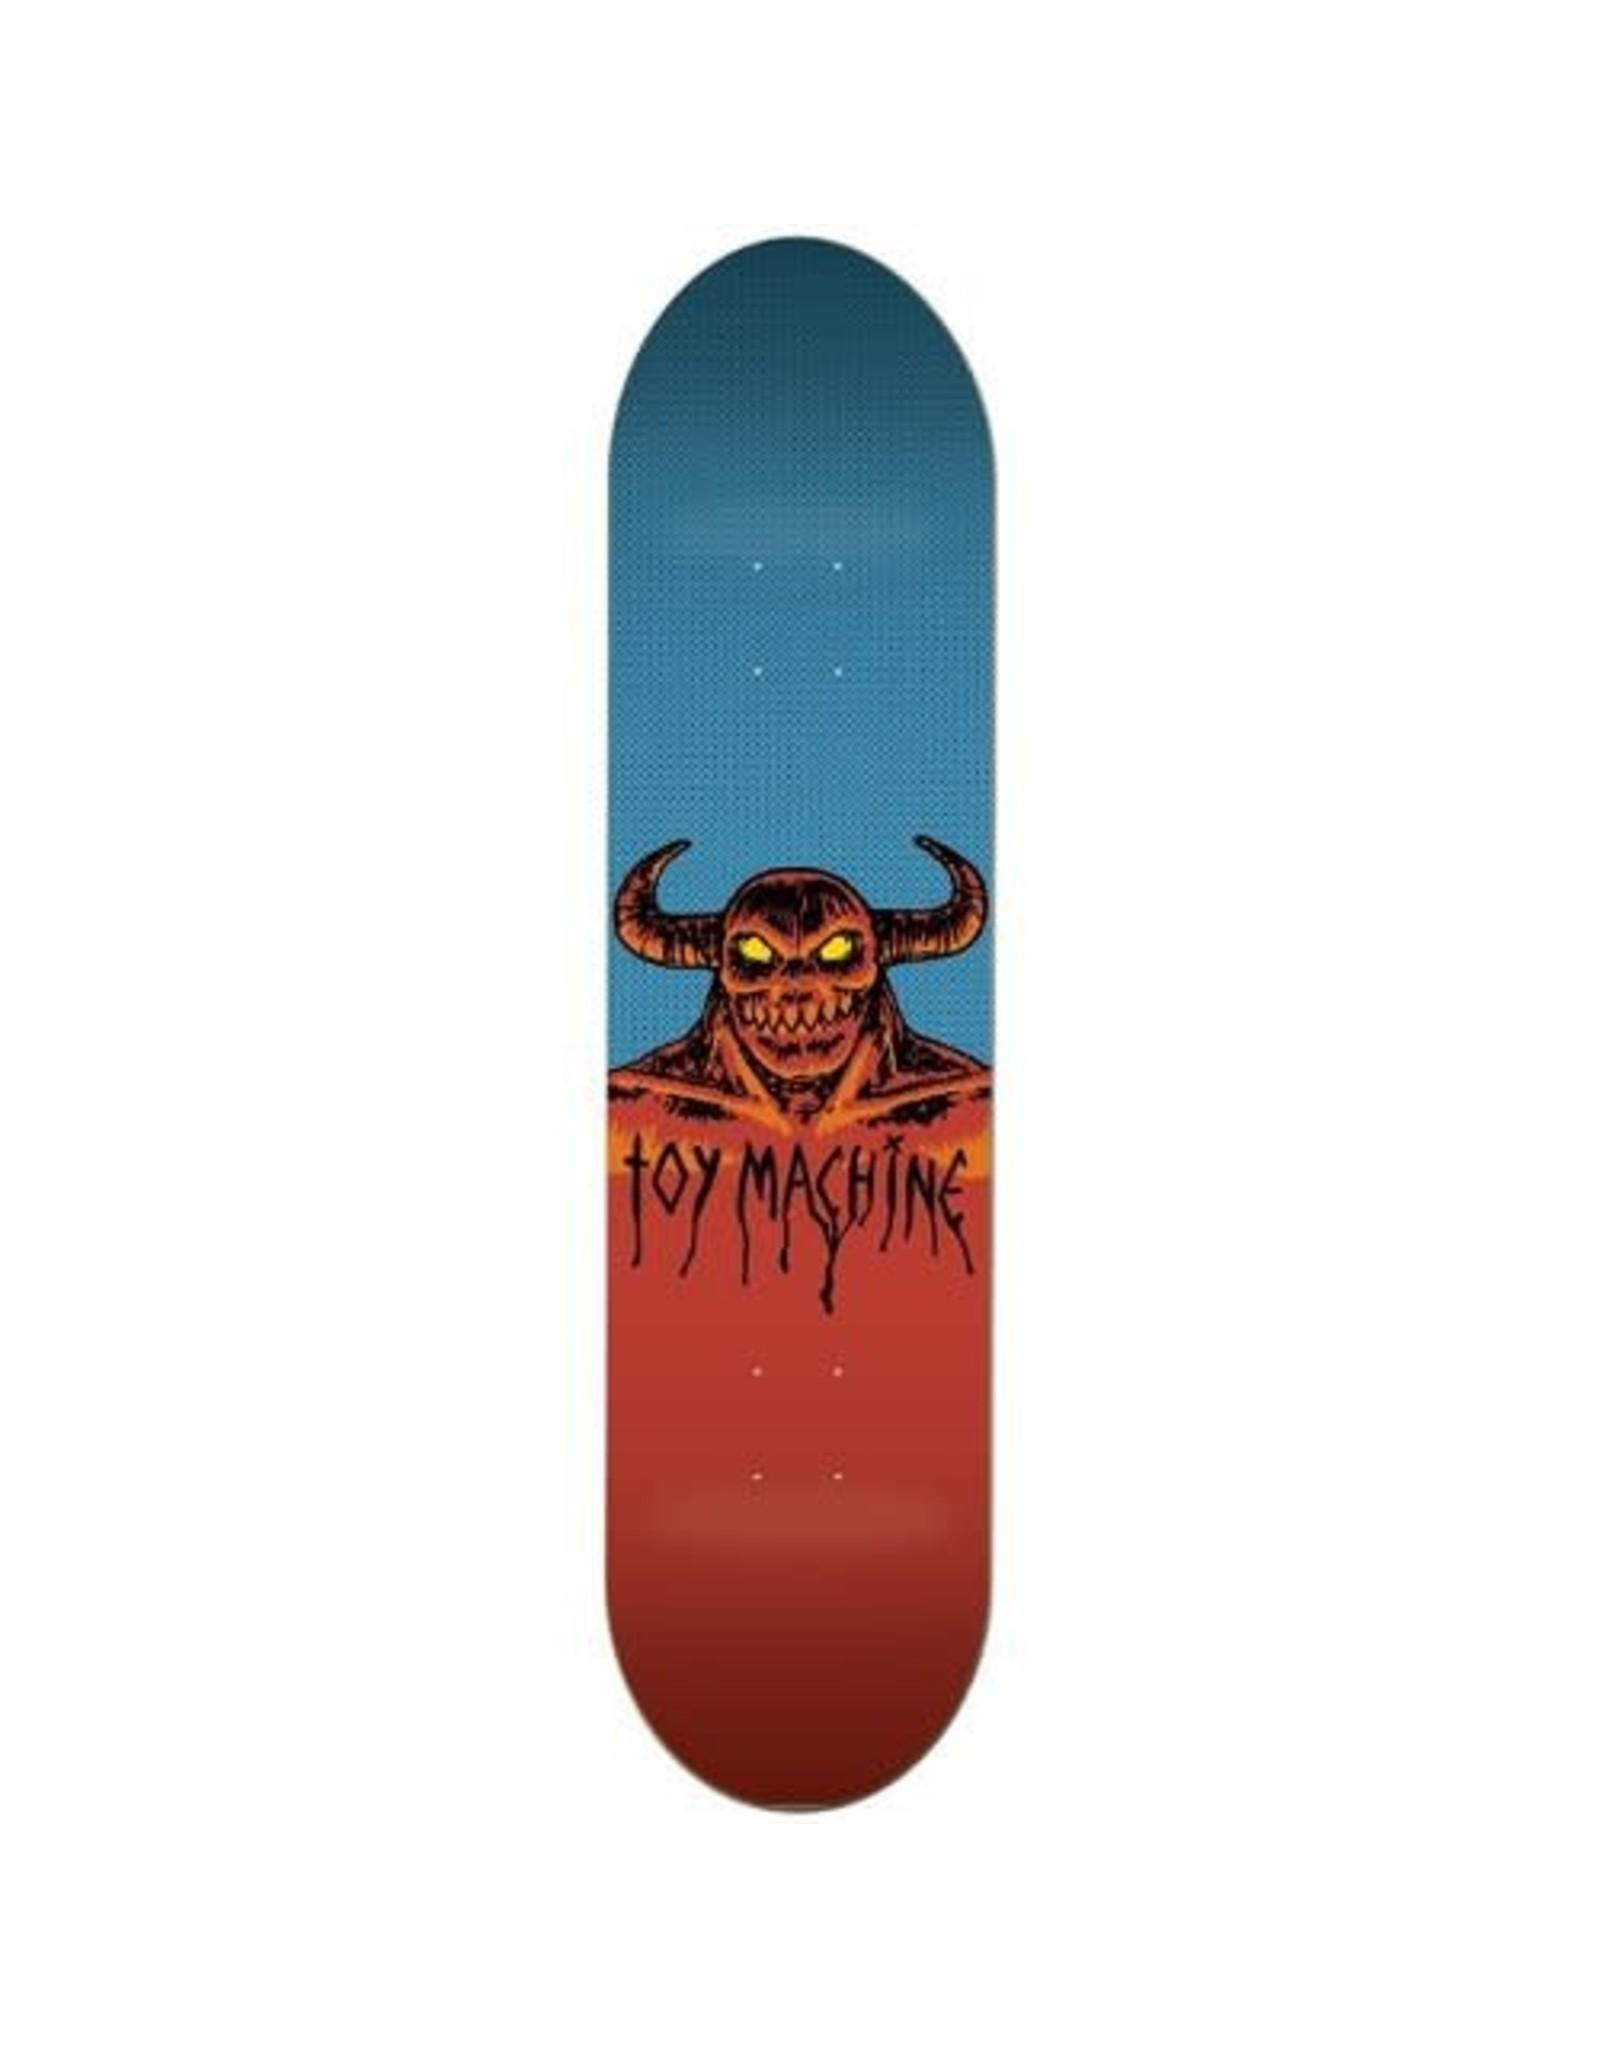 Toy Machine Skateboards TOY MACHINE 8.25 HELL MONSTER